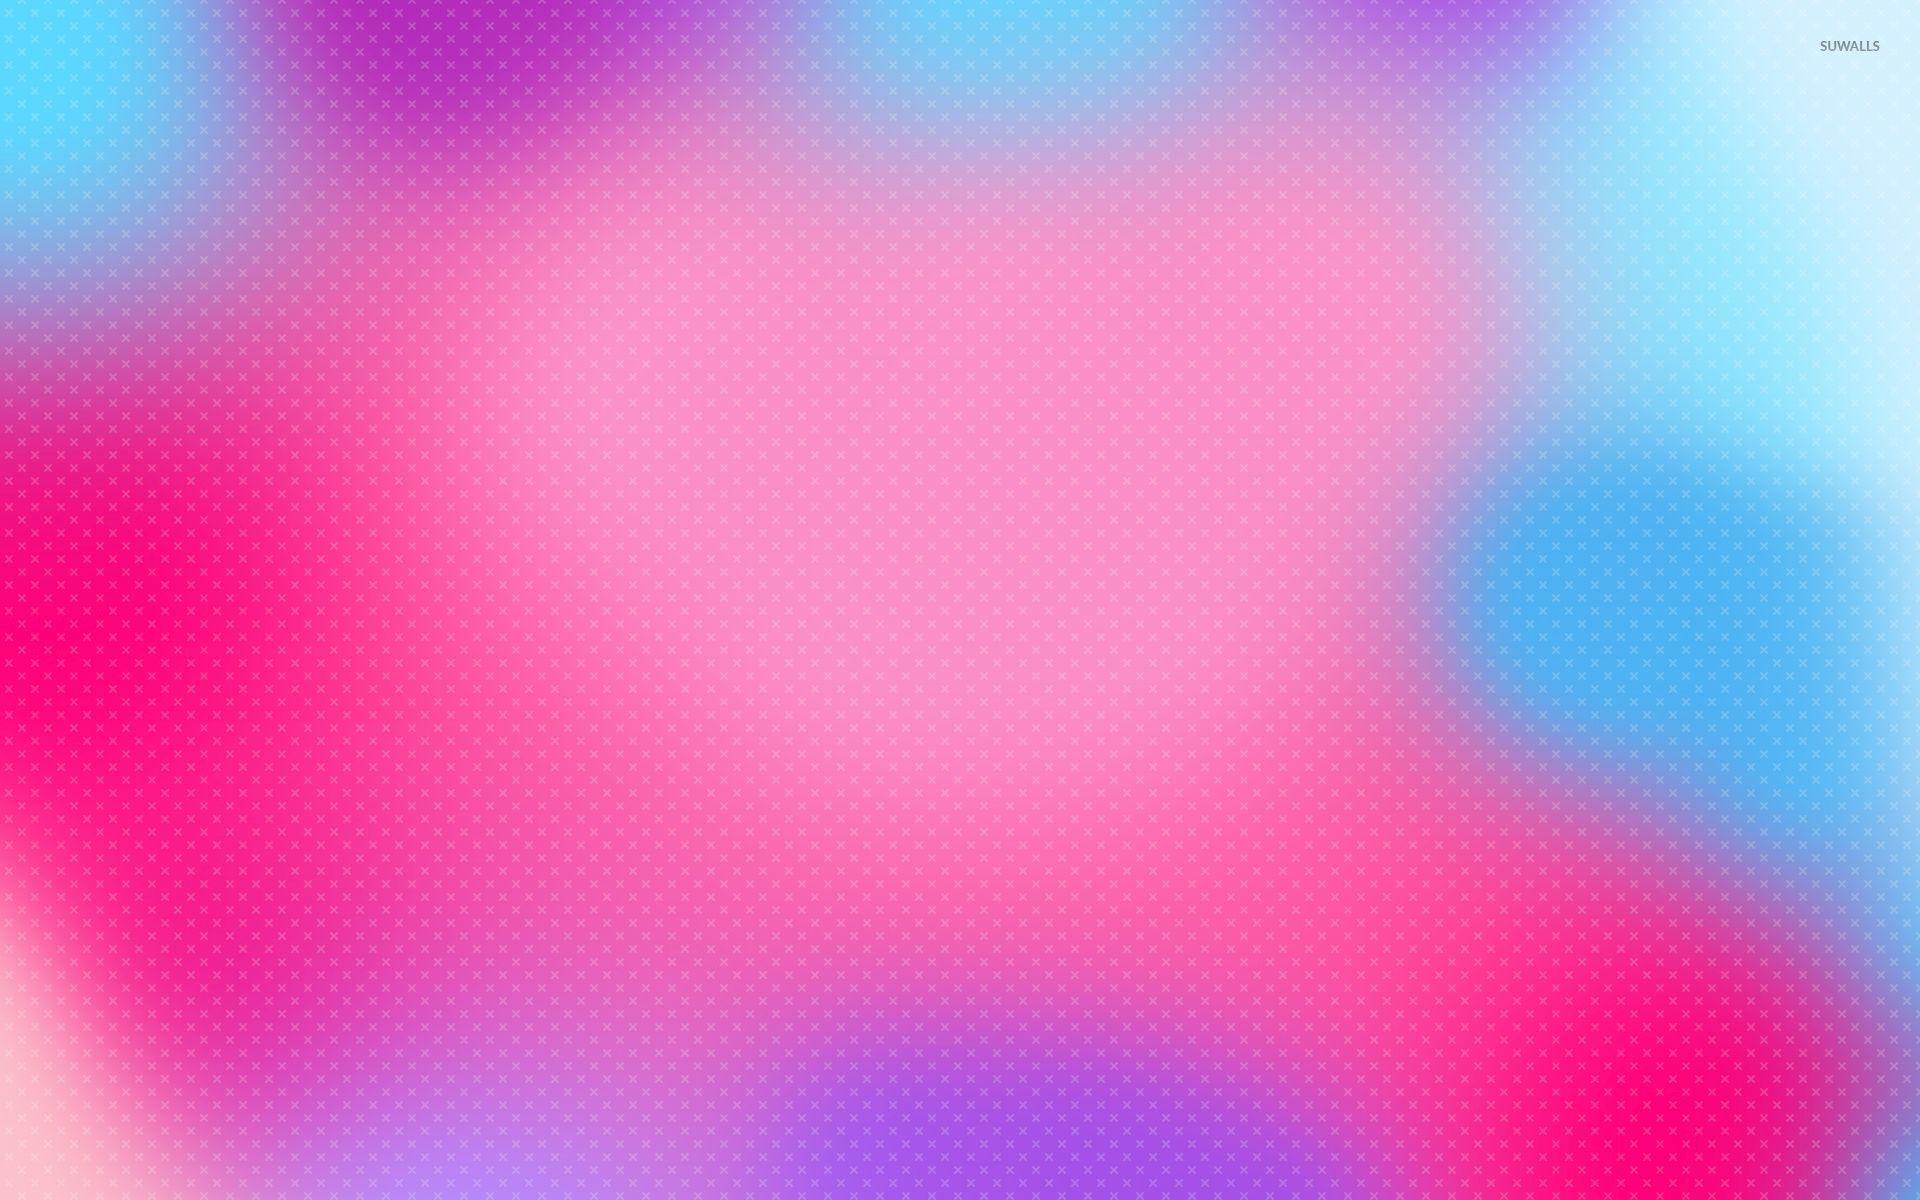 Colorful Blur On White Cross Pattern Wallpaper